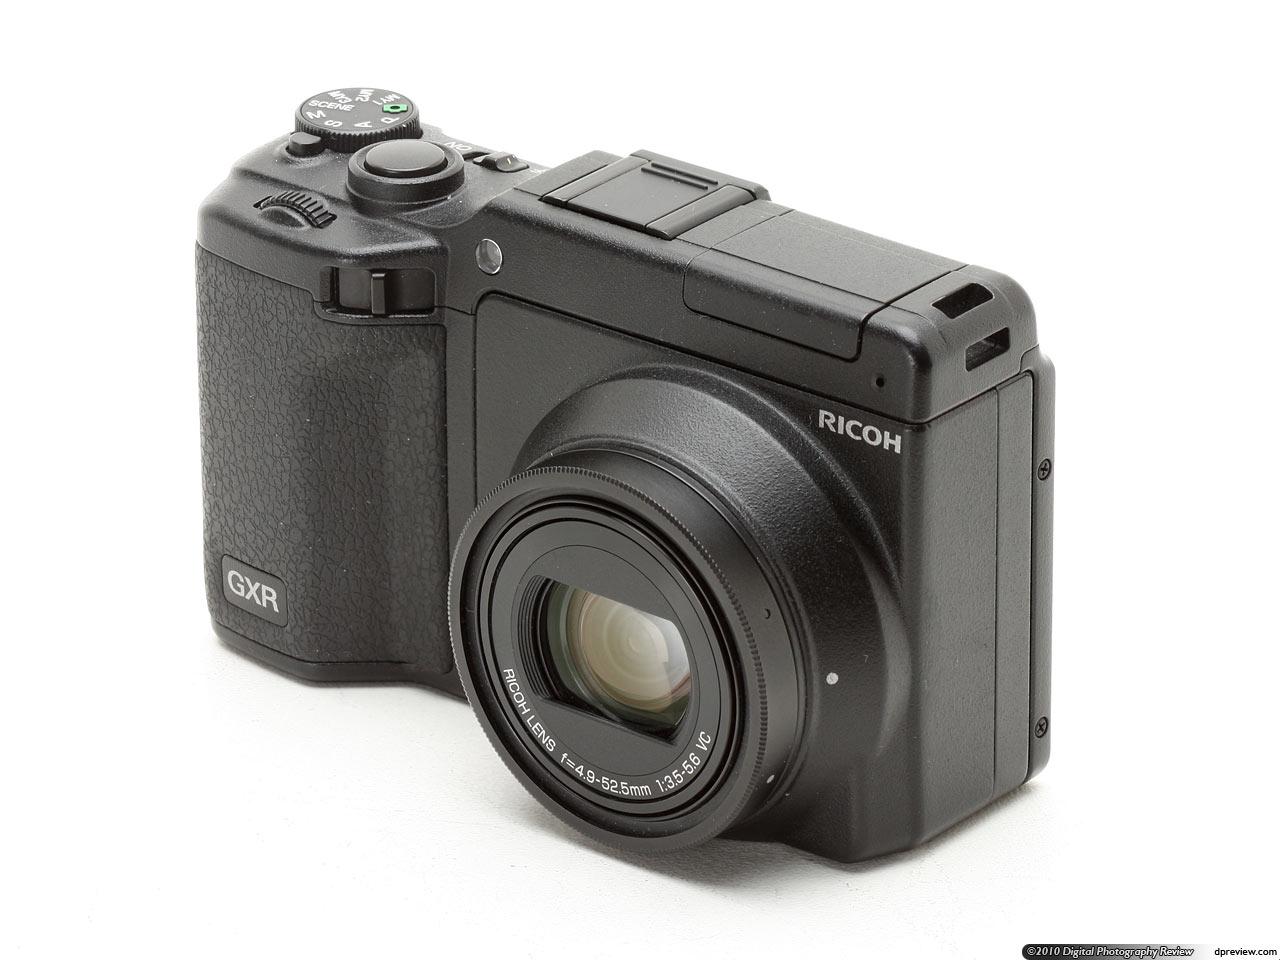 ricoh gxr p10 28 300mm f3 5 5 6 vc quick review digital photography rh dpreview com ricoh gxr user guide Ricoh M-mount GXR A12